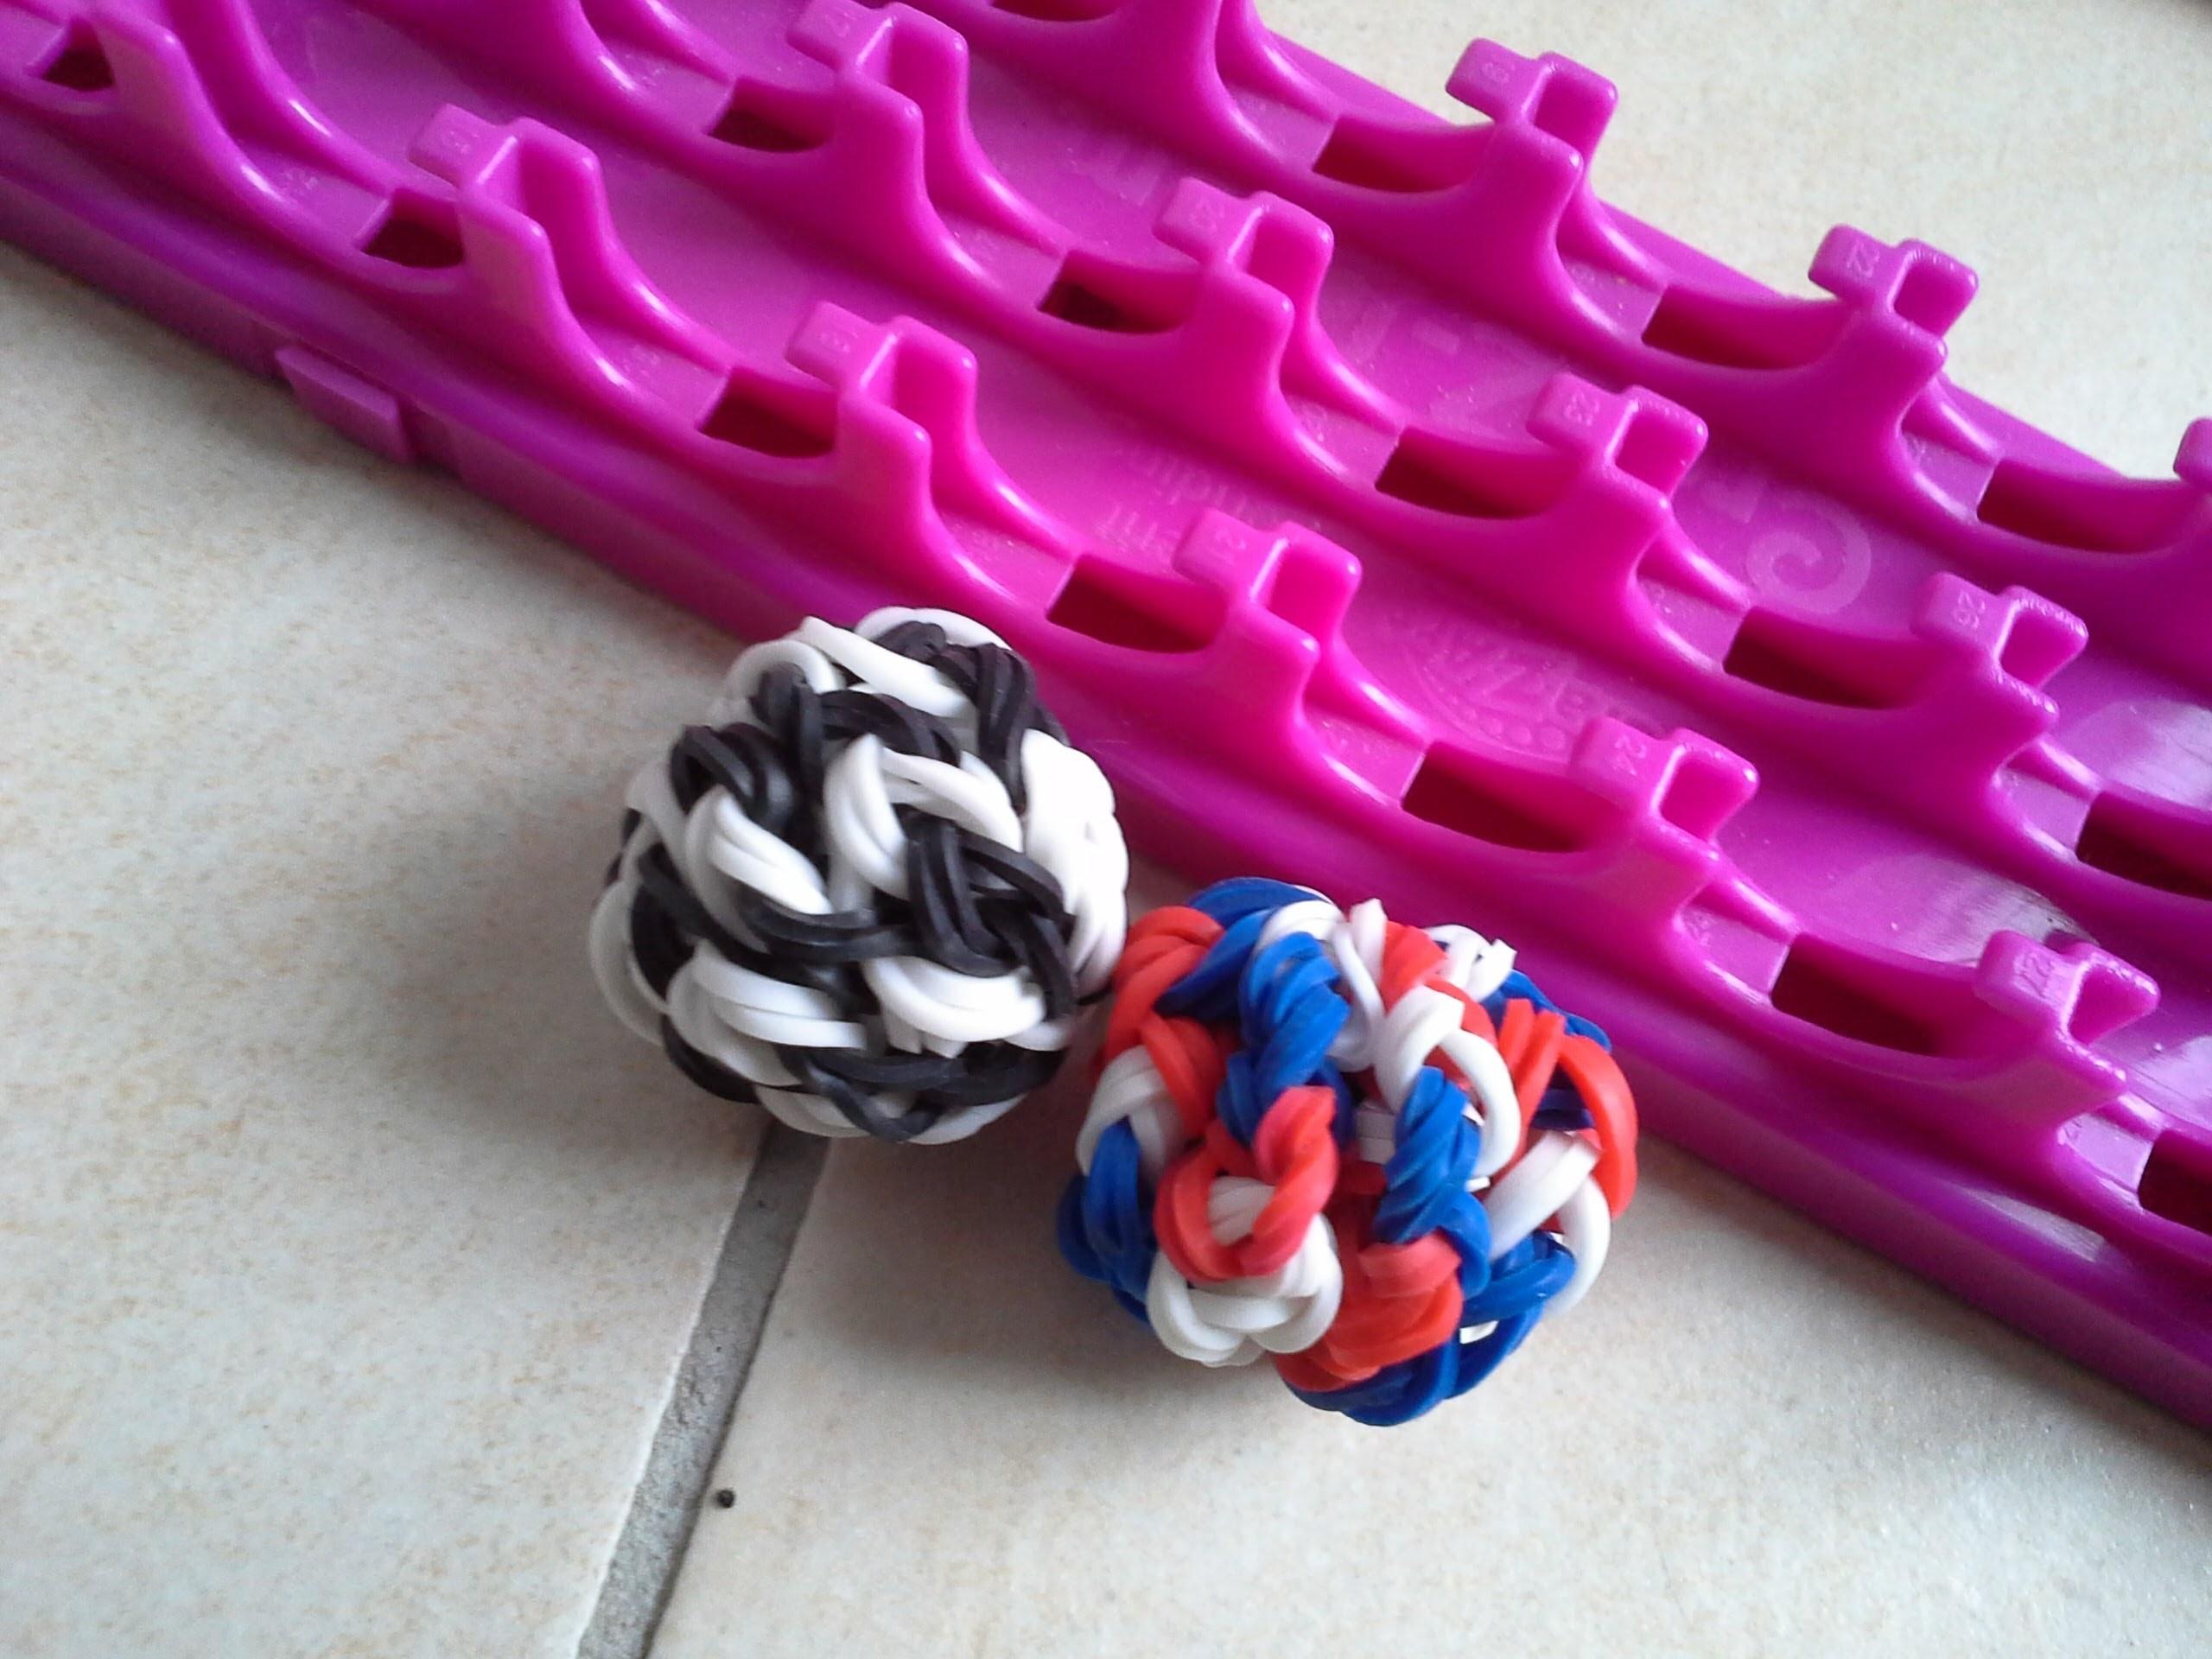 Tutoriel cra-z-loom rainbow loom francais ballon de foot 3D tricolore